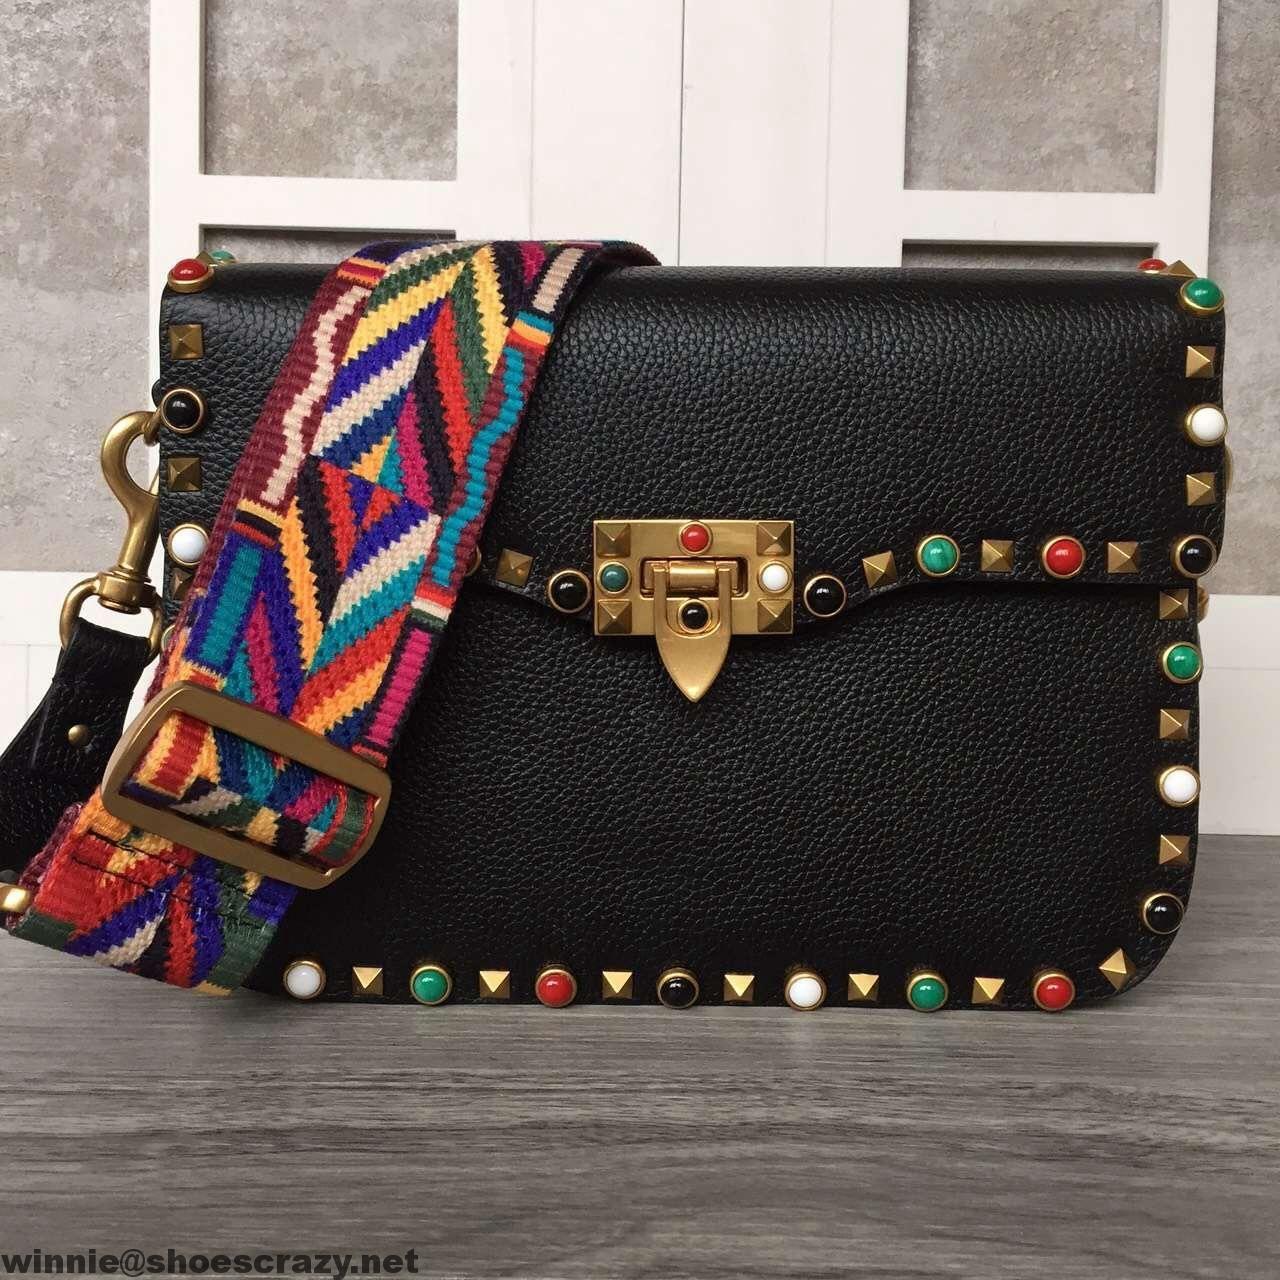 Valentino Garavani Rockstudded Rolling Cross Body Bag With Multicolor Stones 2016